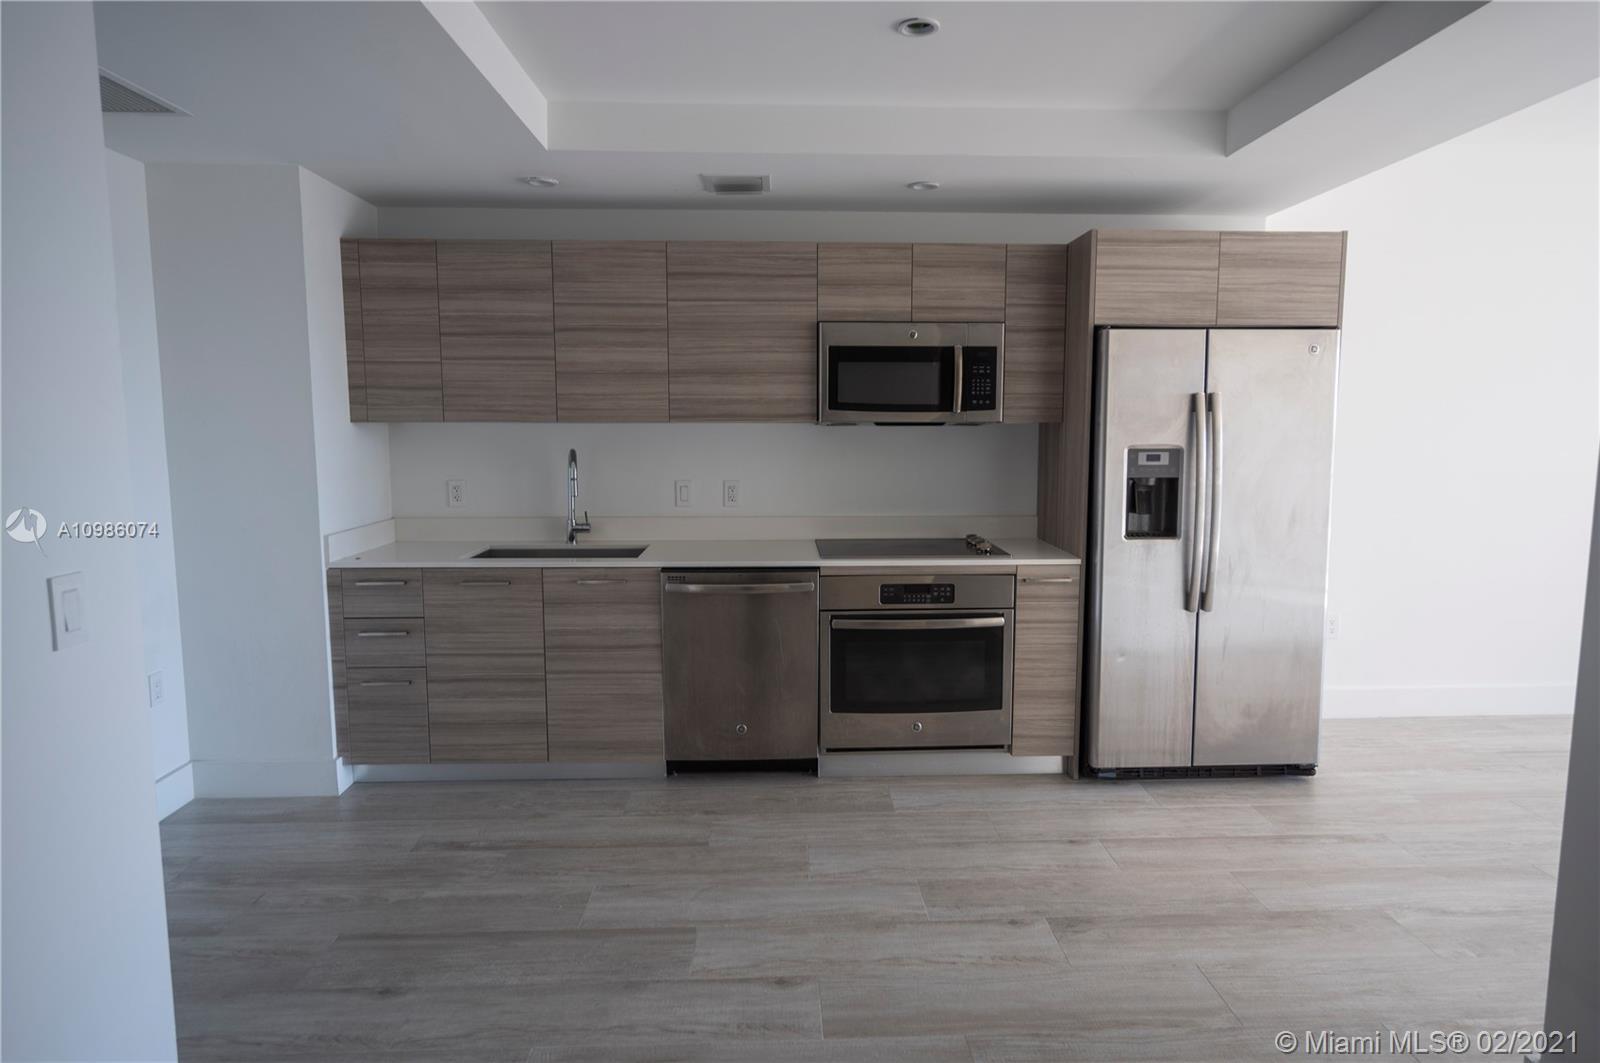 1 bedroom plus den with open floor plan in an unbeatable location in the heart of Midtown. Perfect l